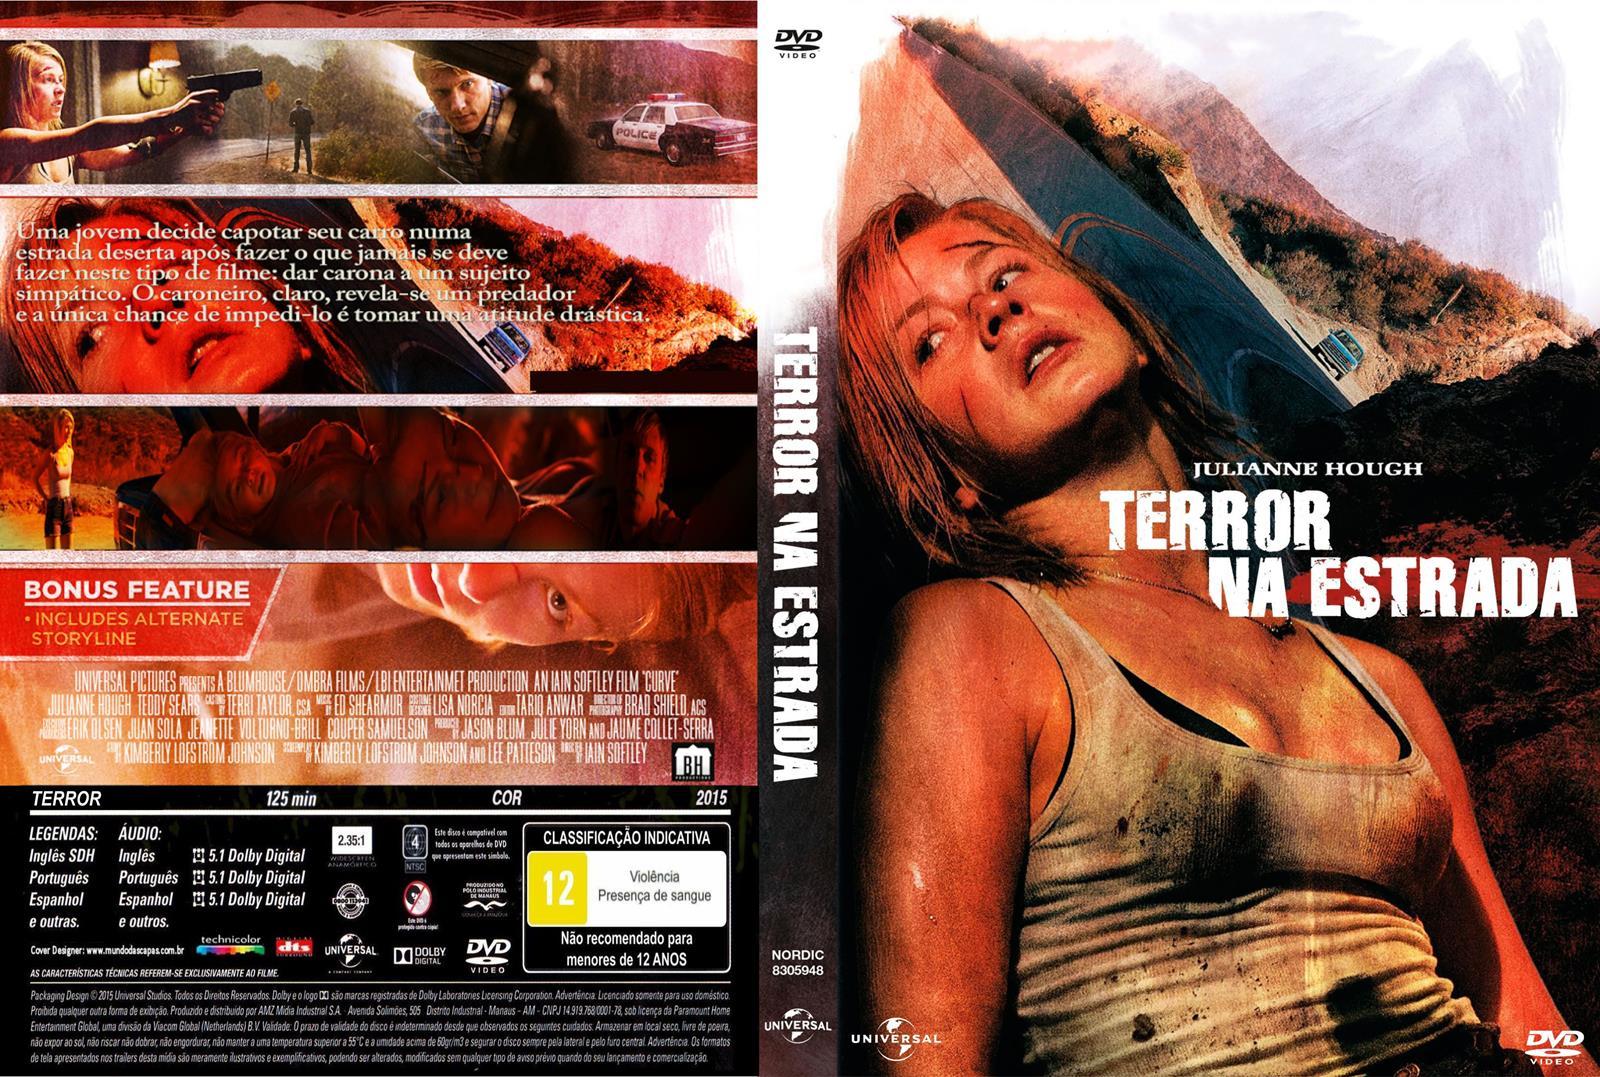 Terror+Na+Estrada.jpg (1600×1077)